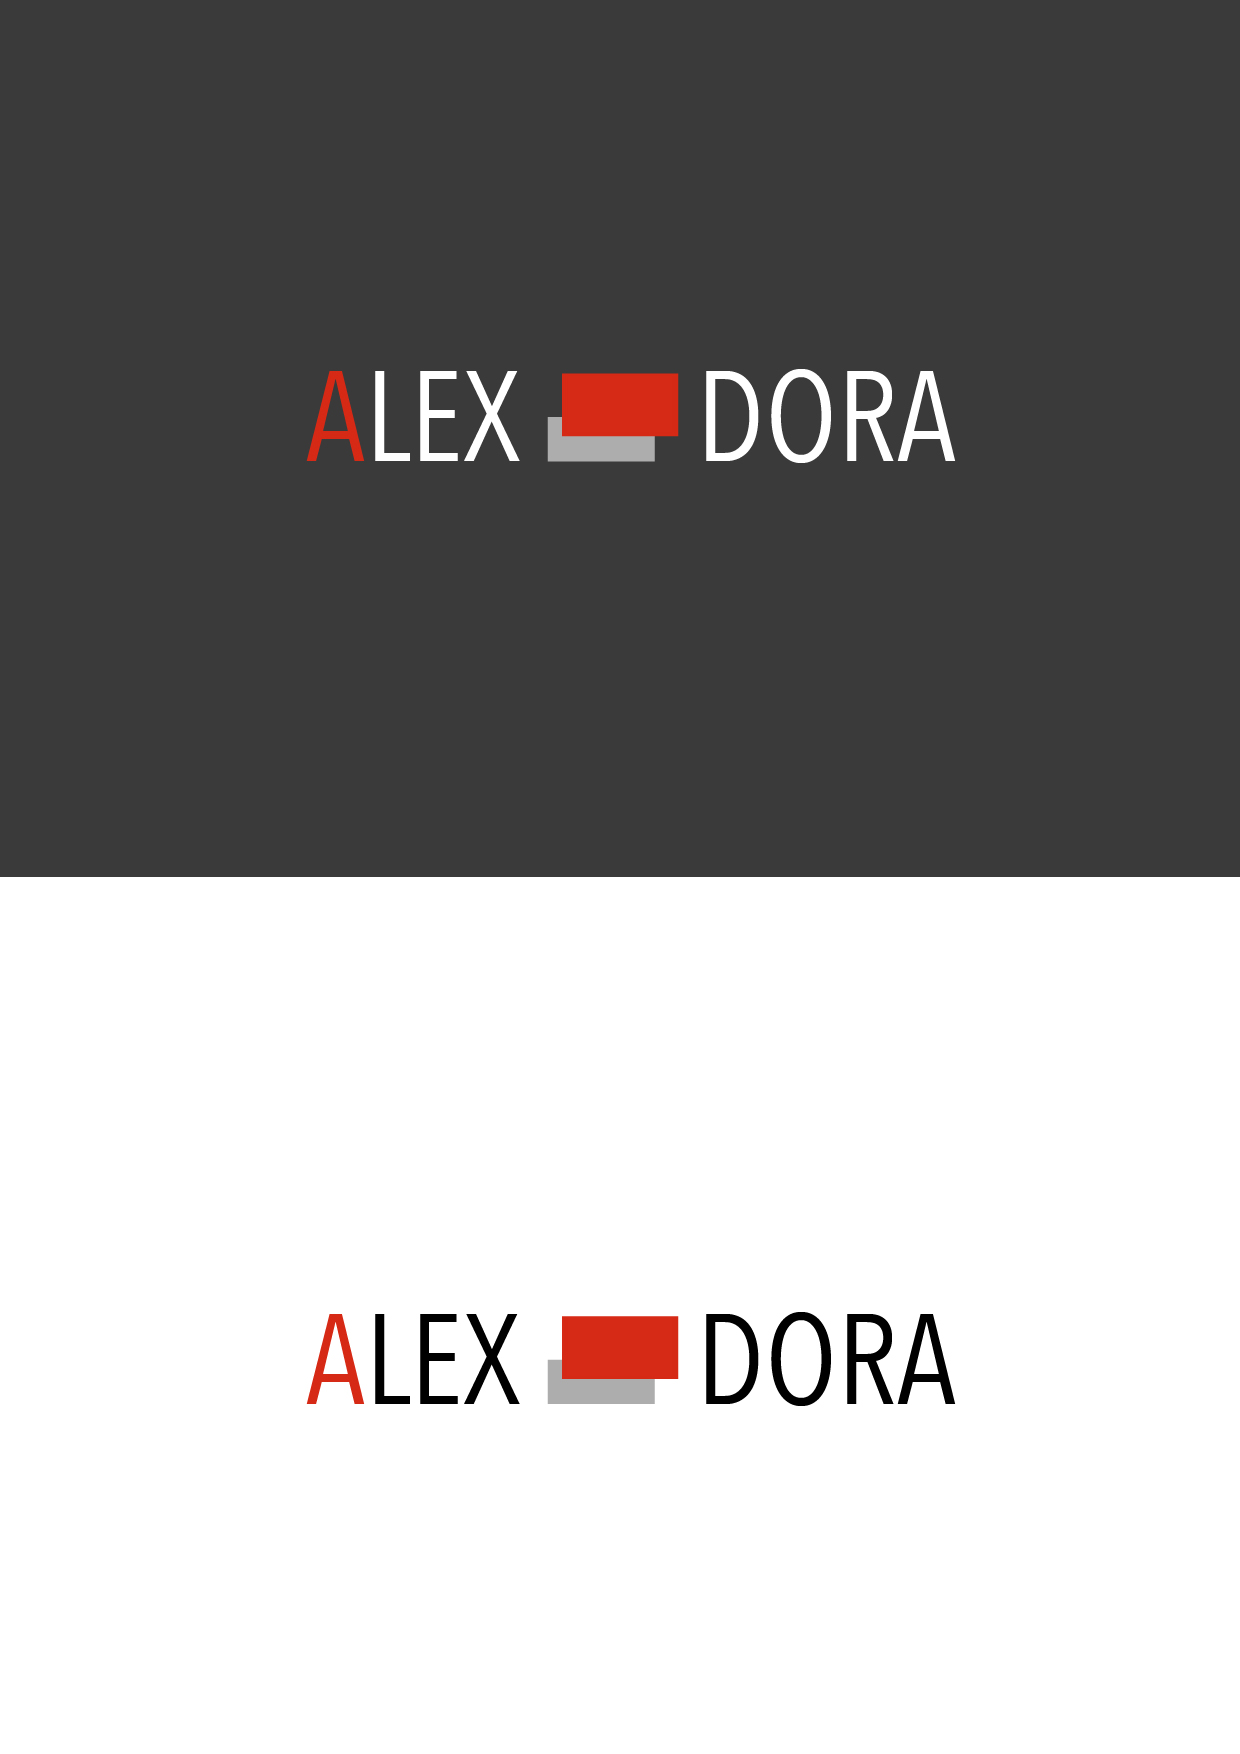 Необходим дизайнер для доработки логотипа бренда одежды фото f_6585b366df5e9631.jpg